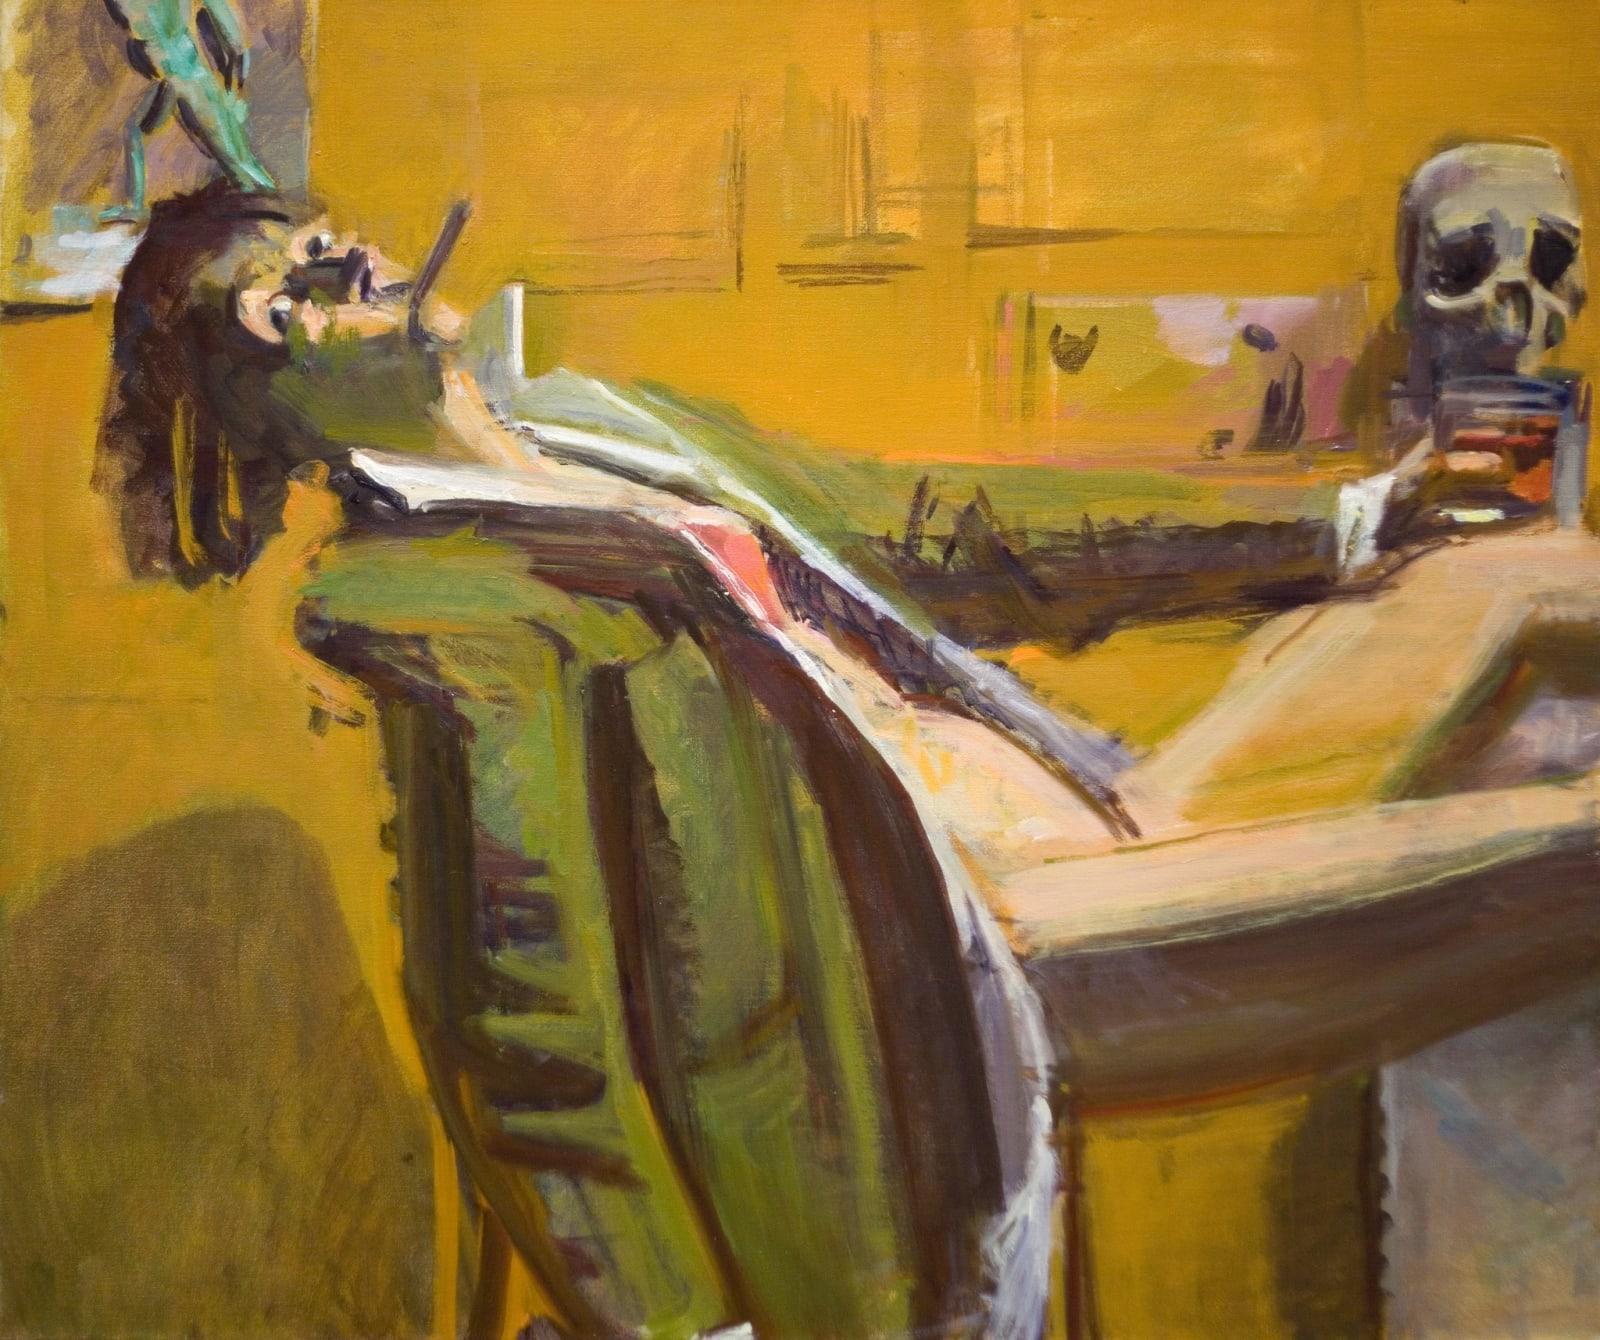 Cherry Pickles, My Sullen Art: Self-Portrait as Dylan Thomas, 2011